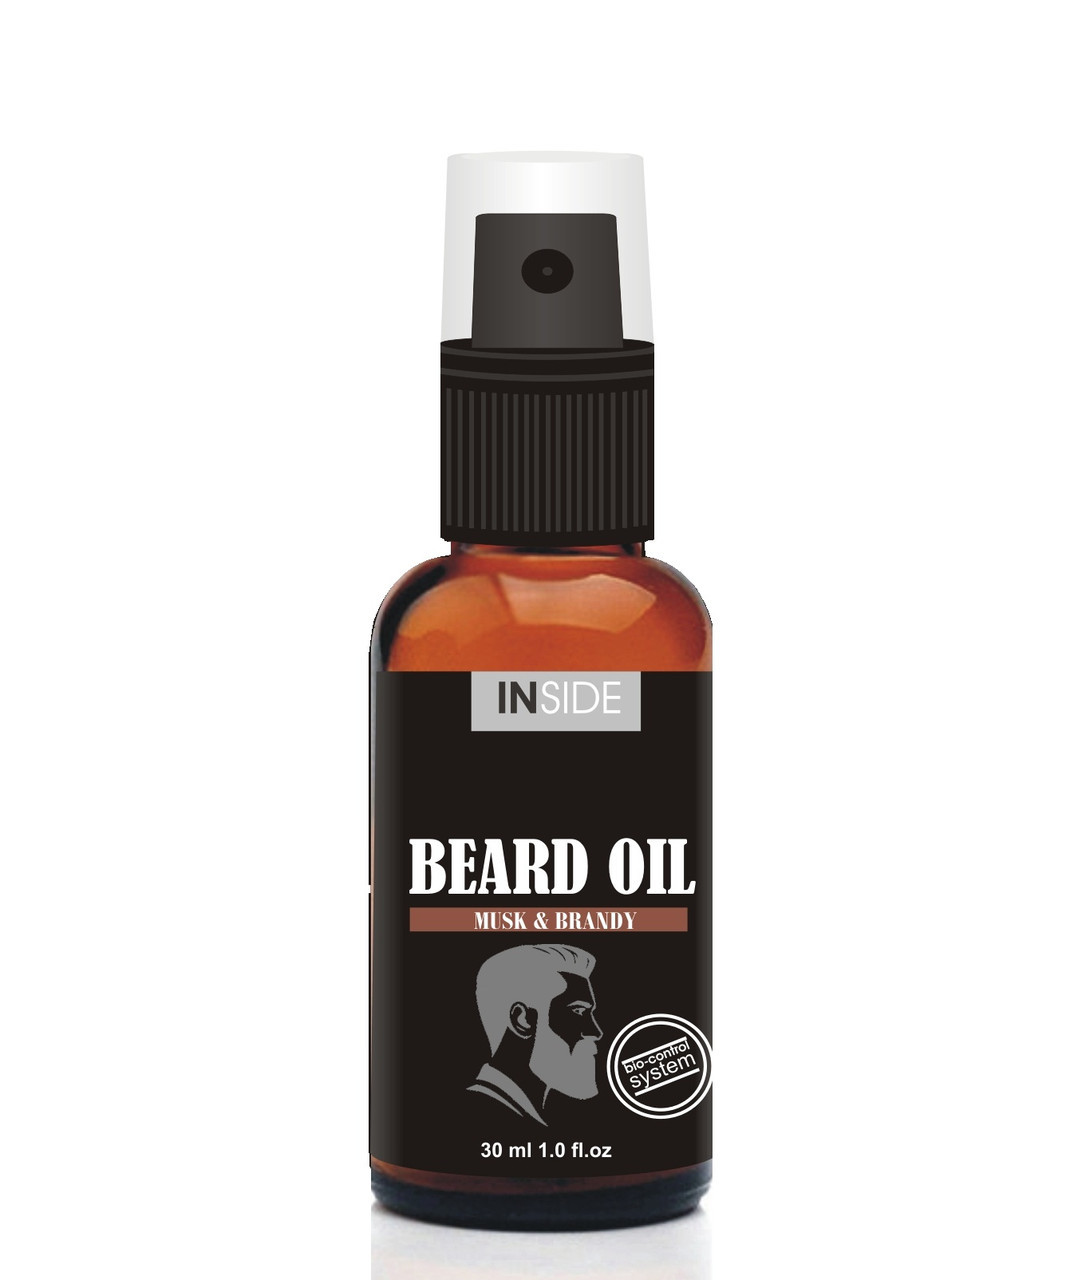 Масло для бороды с феромонами Inside Beard Oil Musk and Brandy